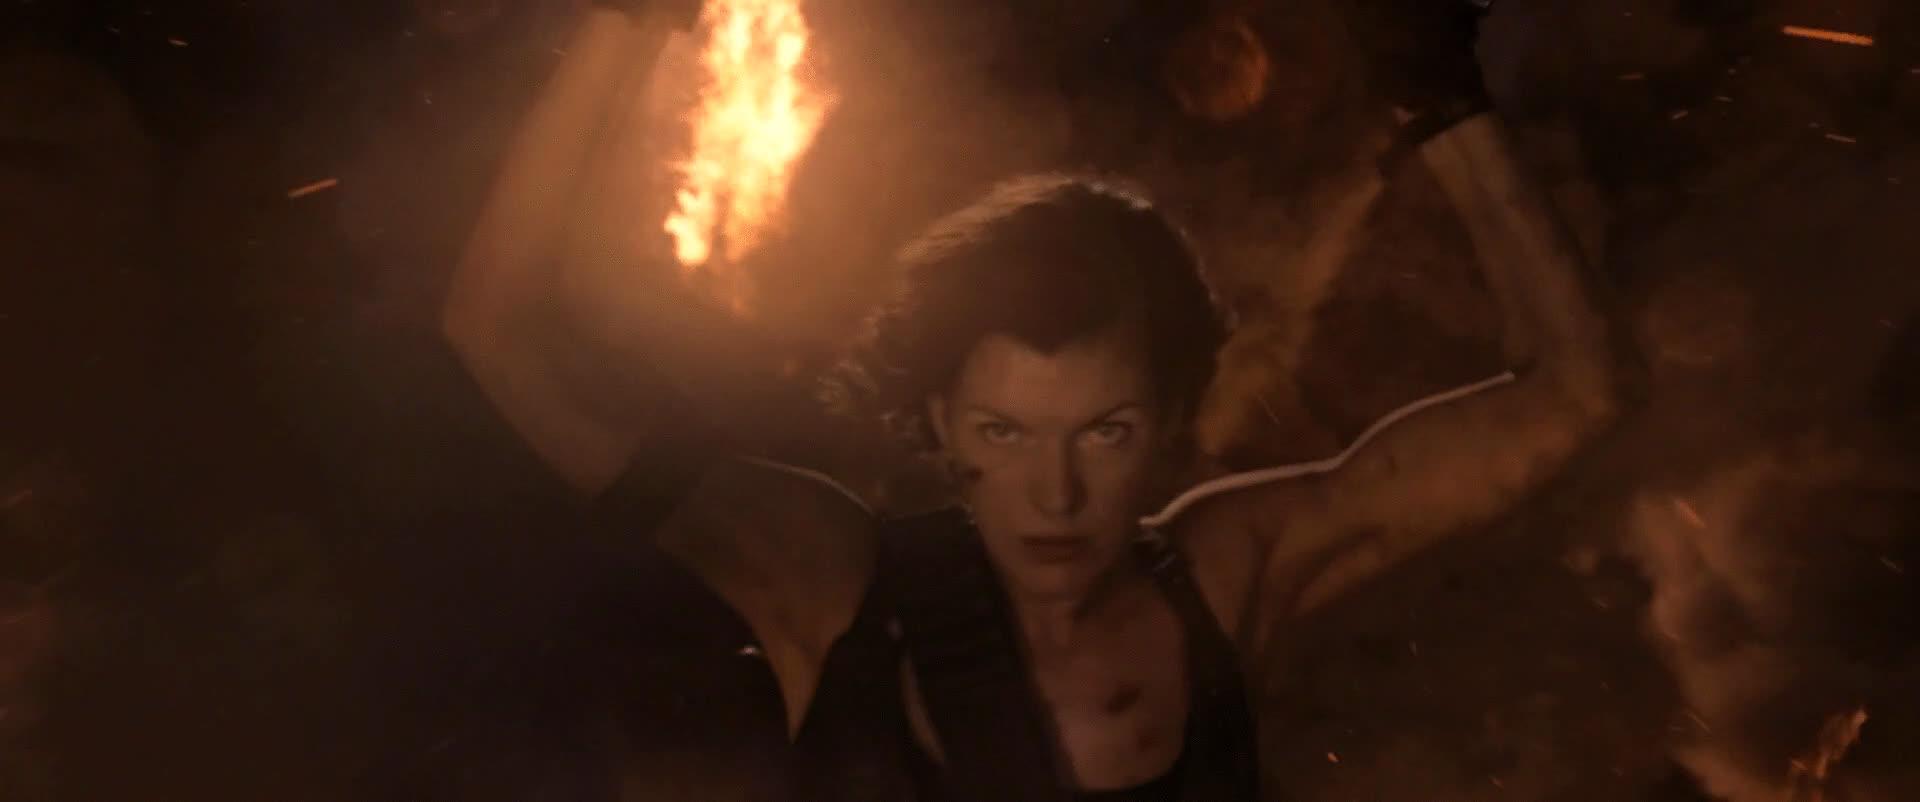 CelebrityArmpits, armpits, millajovovich, Milla Jovovich Resident Evil: The Final Chapter (2016) gif (reddit) GIFs